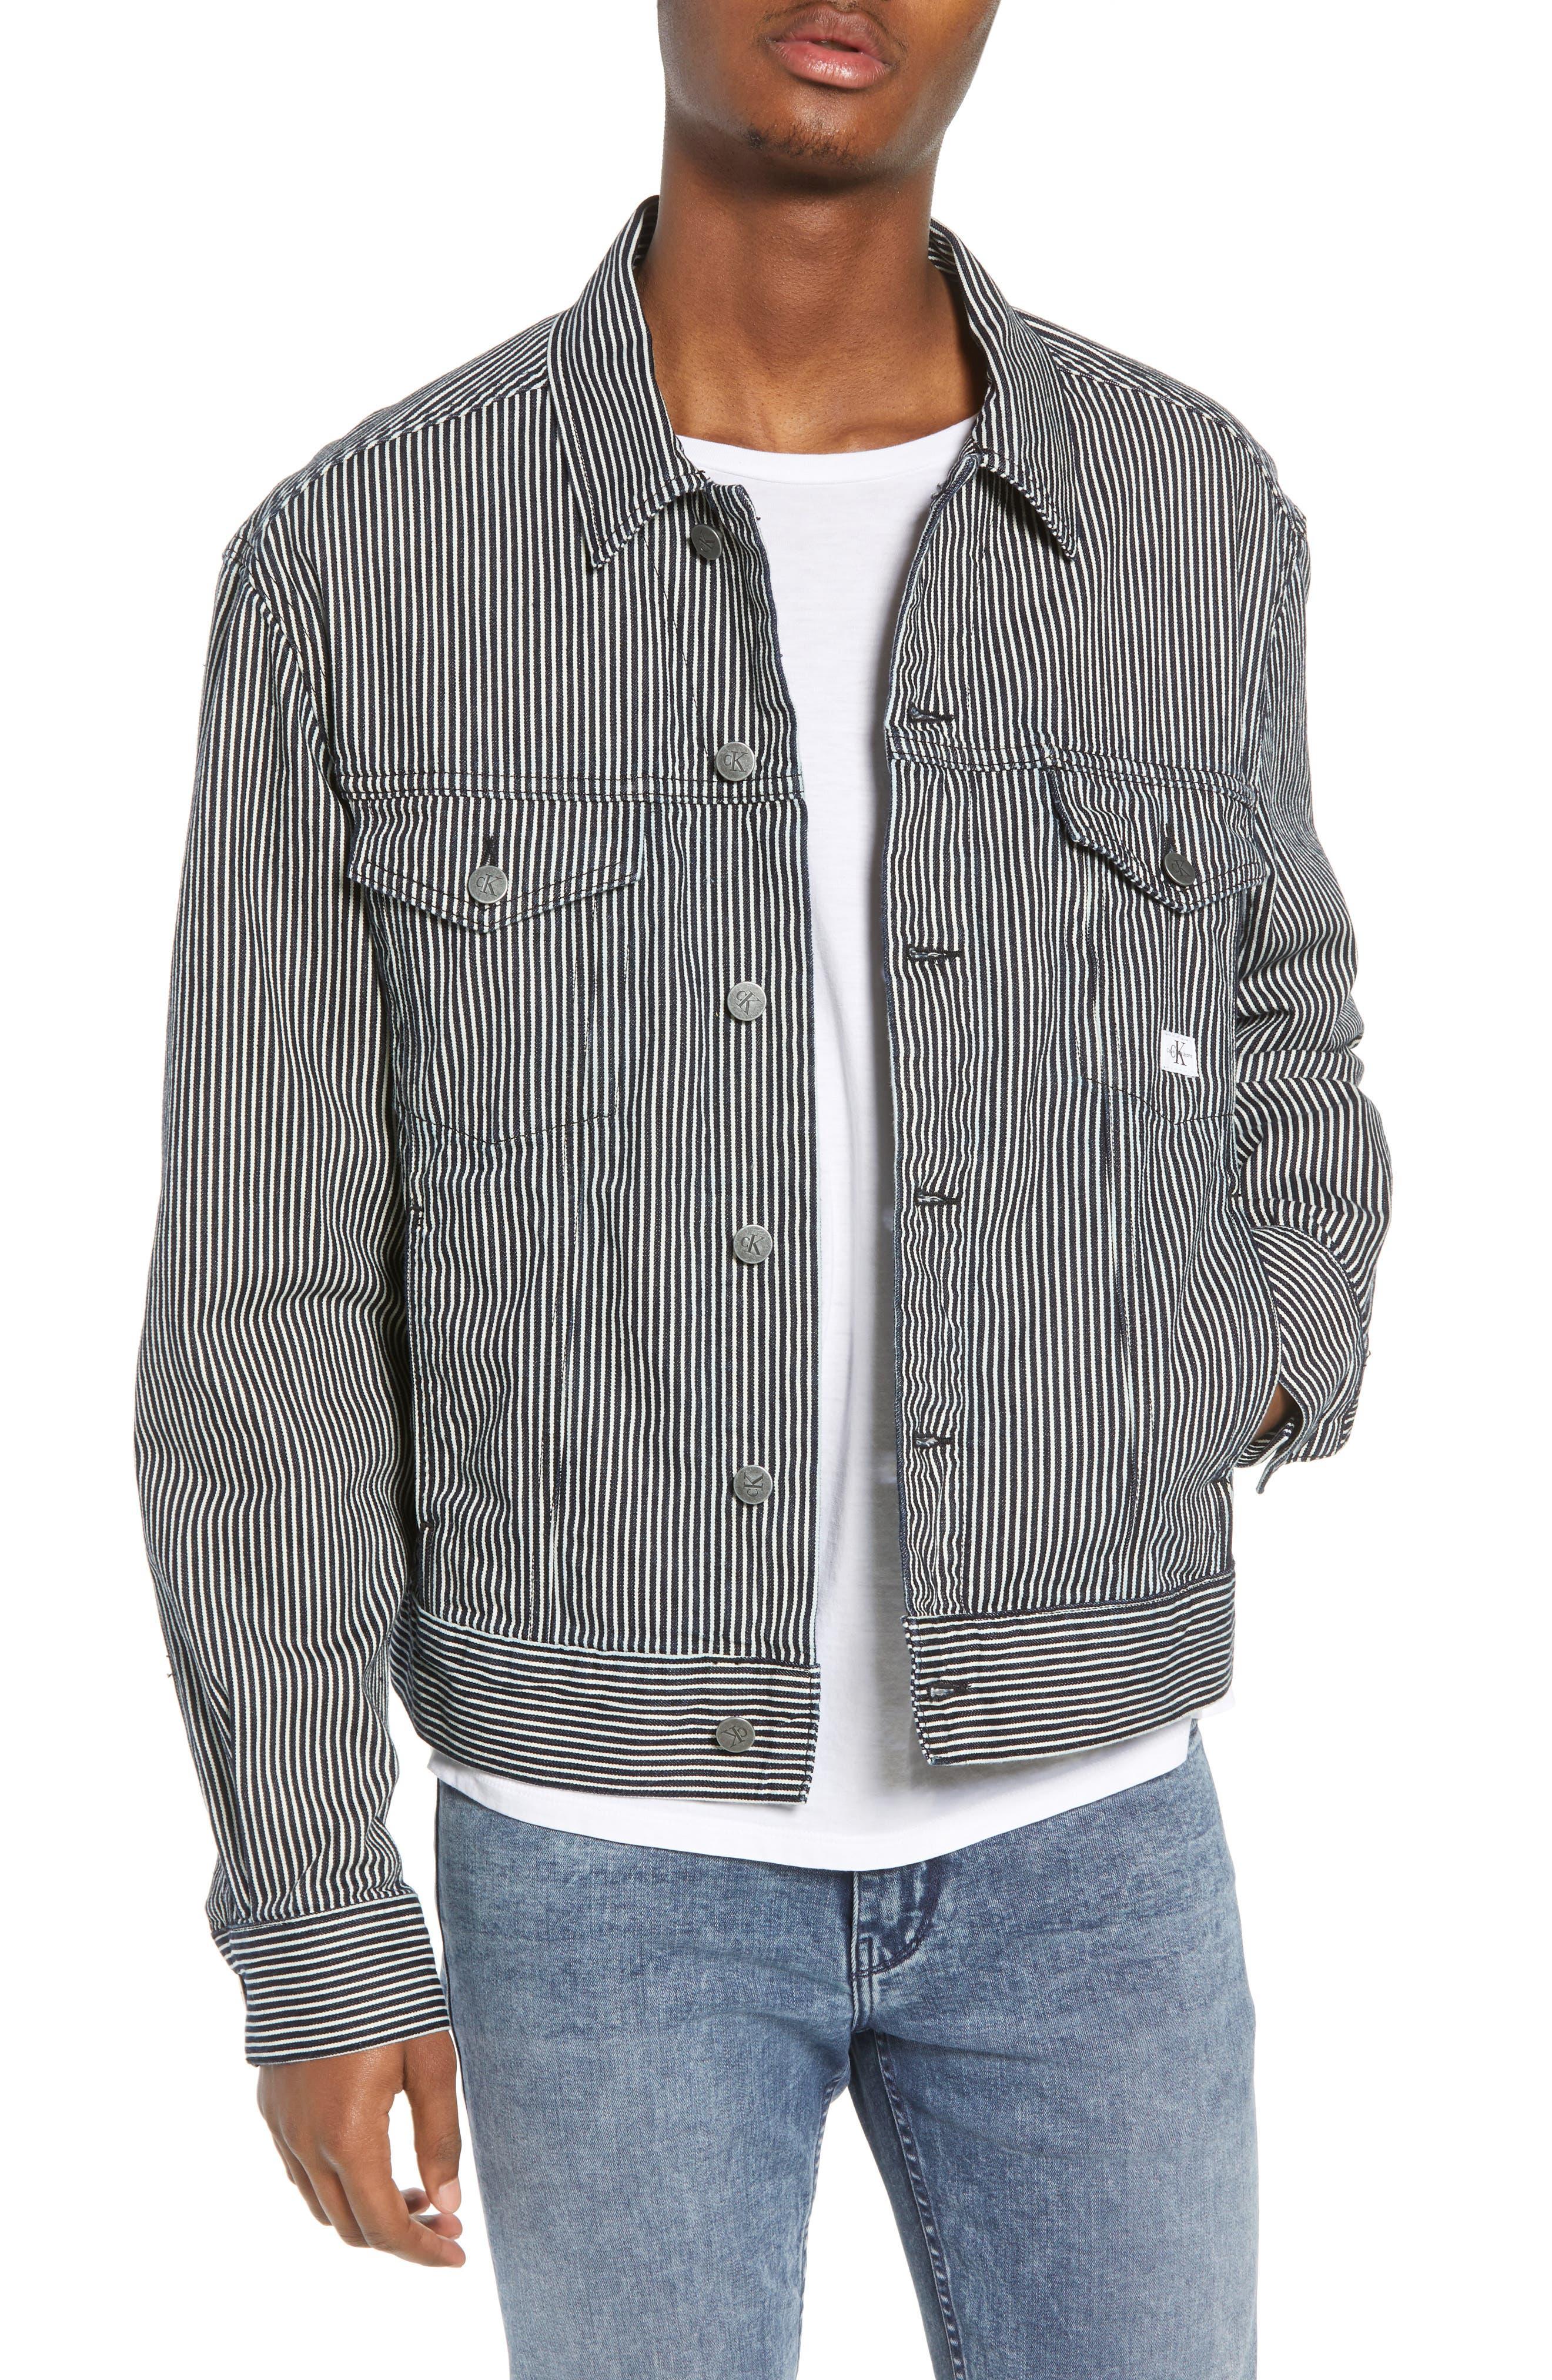 Main Image - Calvin Klein Jeans Archive Trucker Jacket